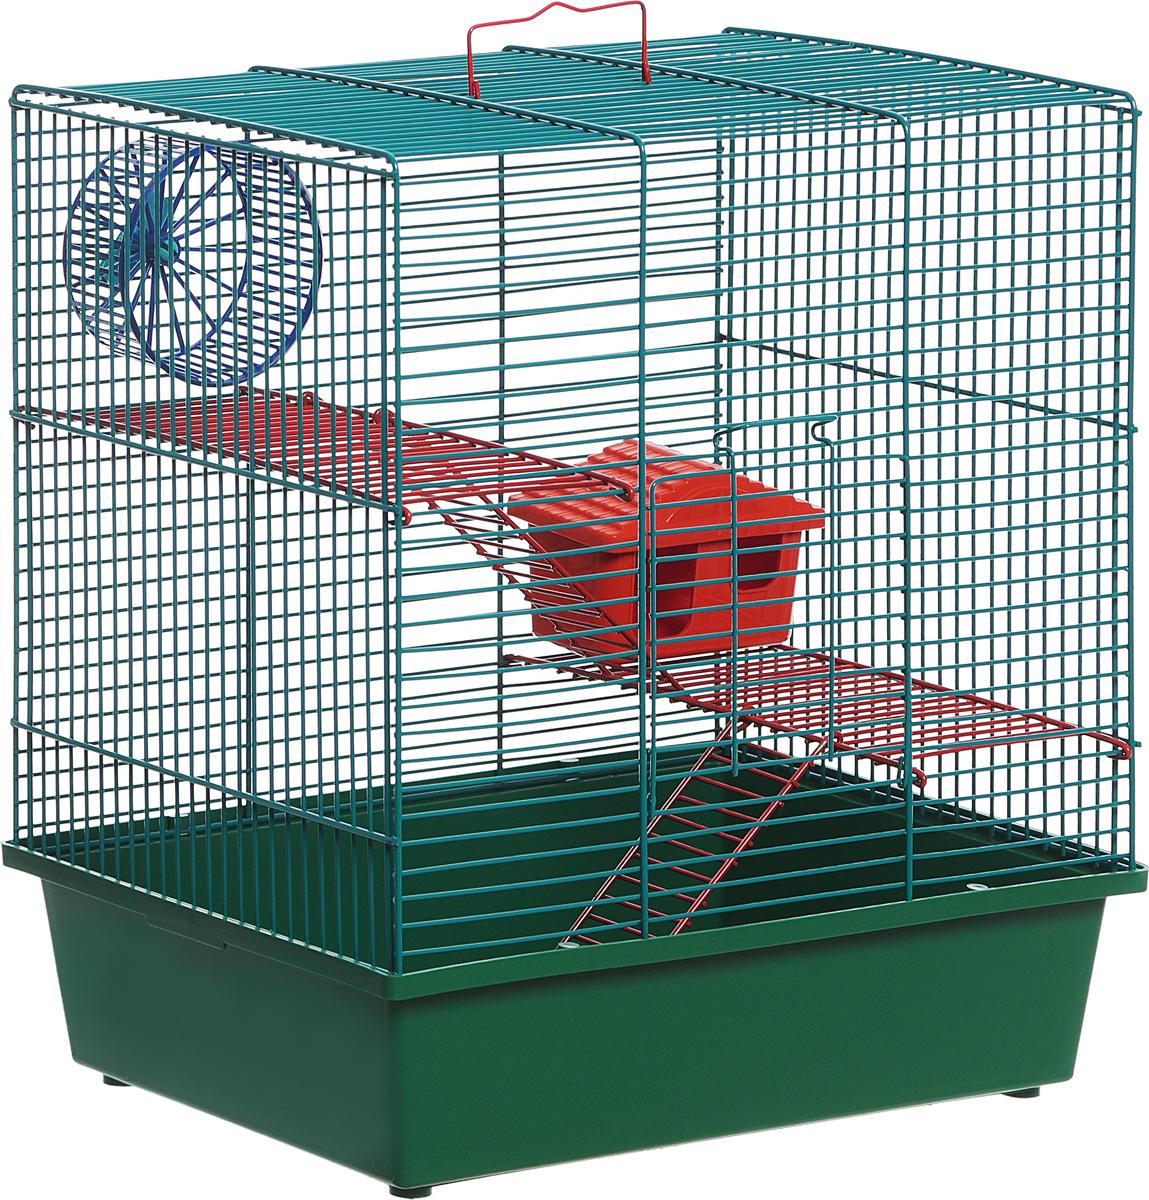 Клетка для грызунов Велес Lusy Hamster-3к, 3-этажная, цвет: зеленый, 35 х 26 х 40 см клетка для грызунов велес lusy 2 2 этажная цвет красный 30 х 42 х 25 см